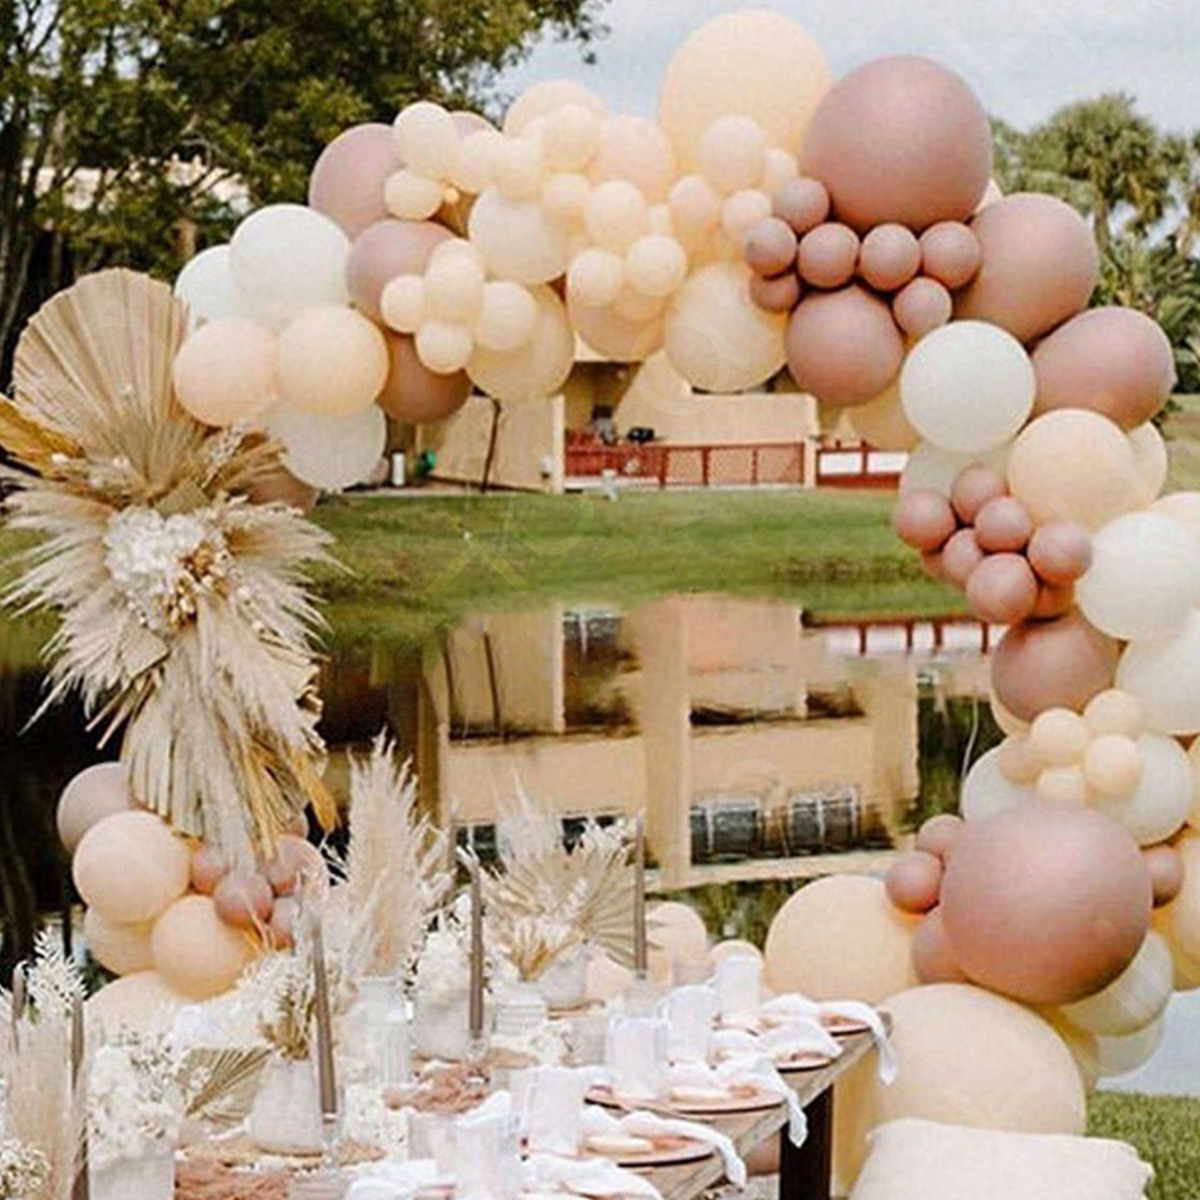 Macaron Pink Balloon Garland Arch Kit Wedding Birthday Party Decoration Kids Globos Rose Gold Confetti Latex Ballon Baby Shower 6